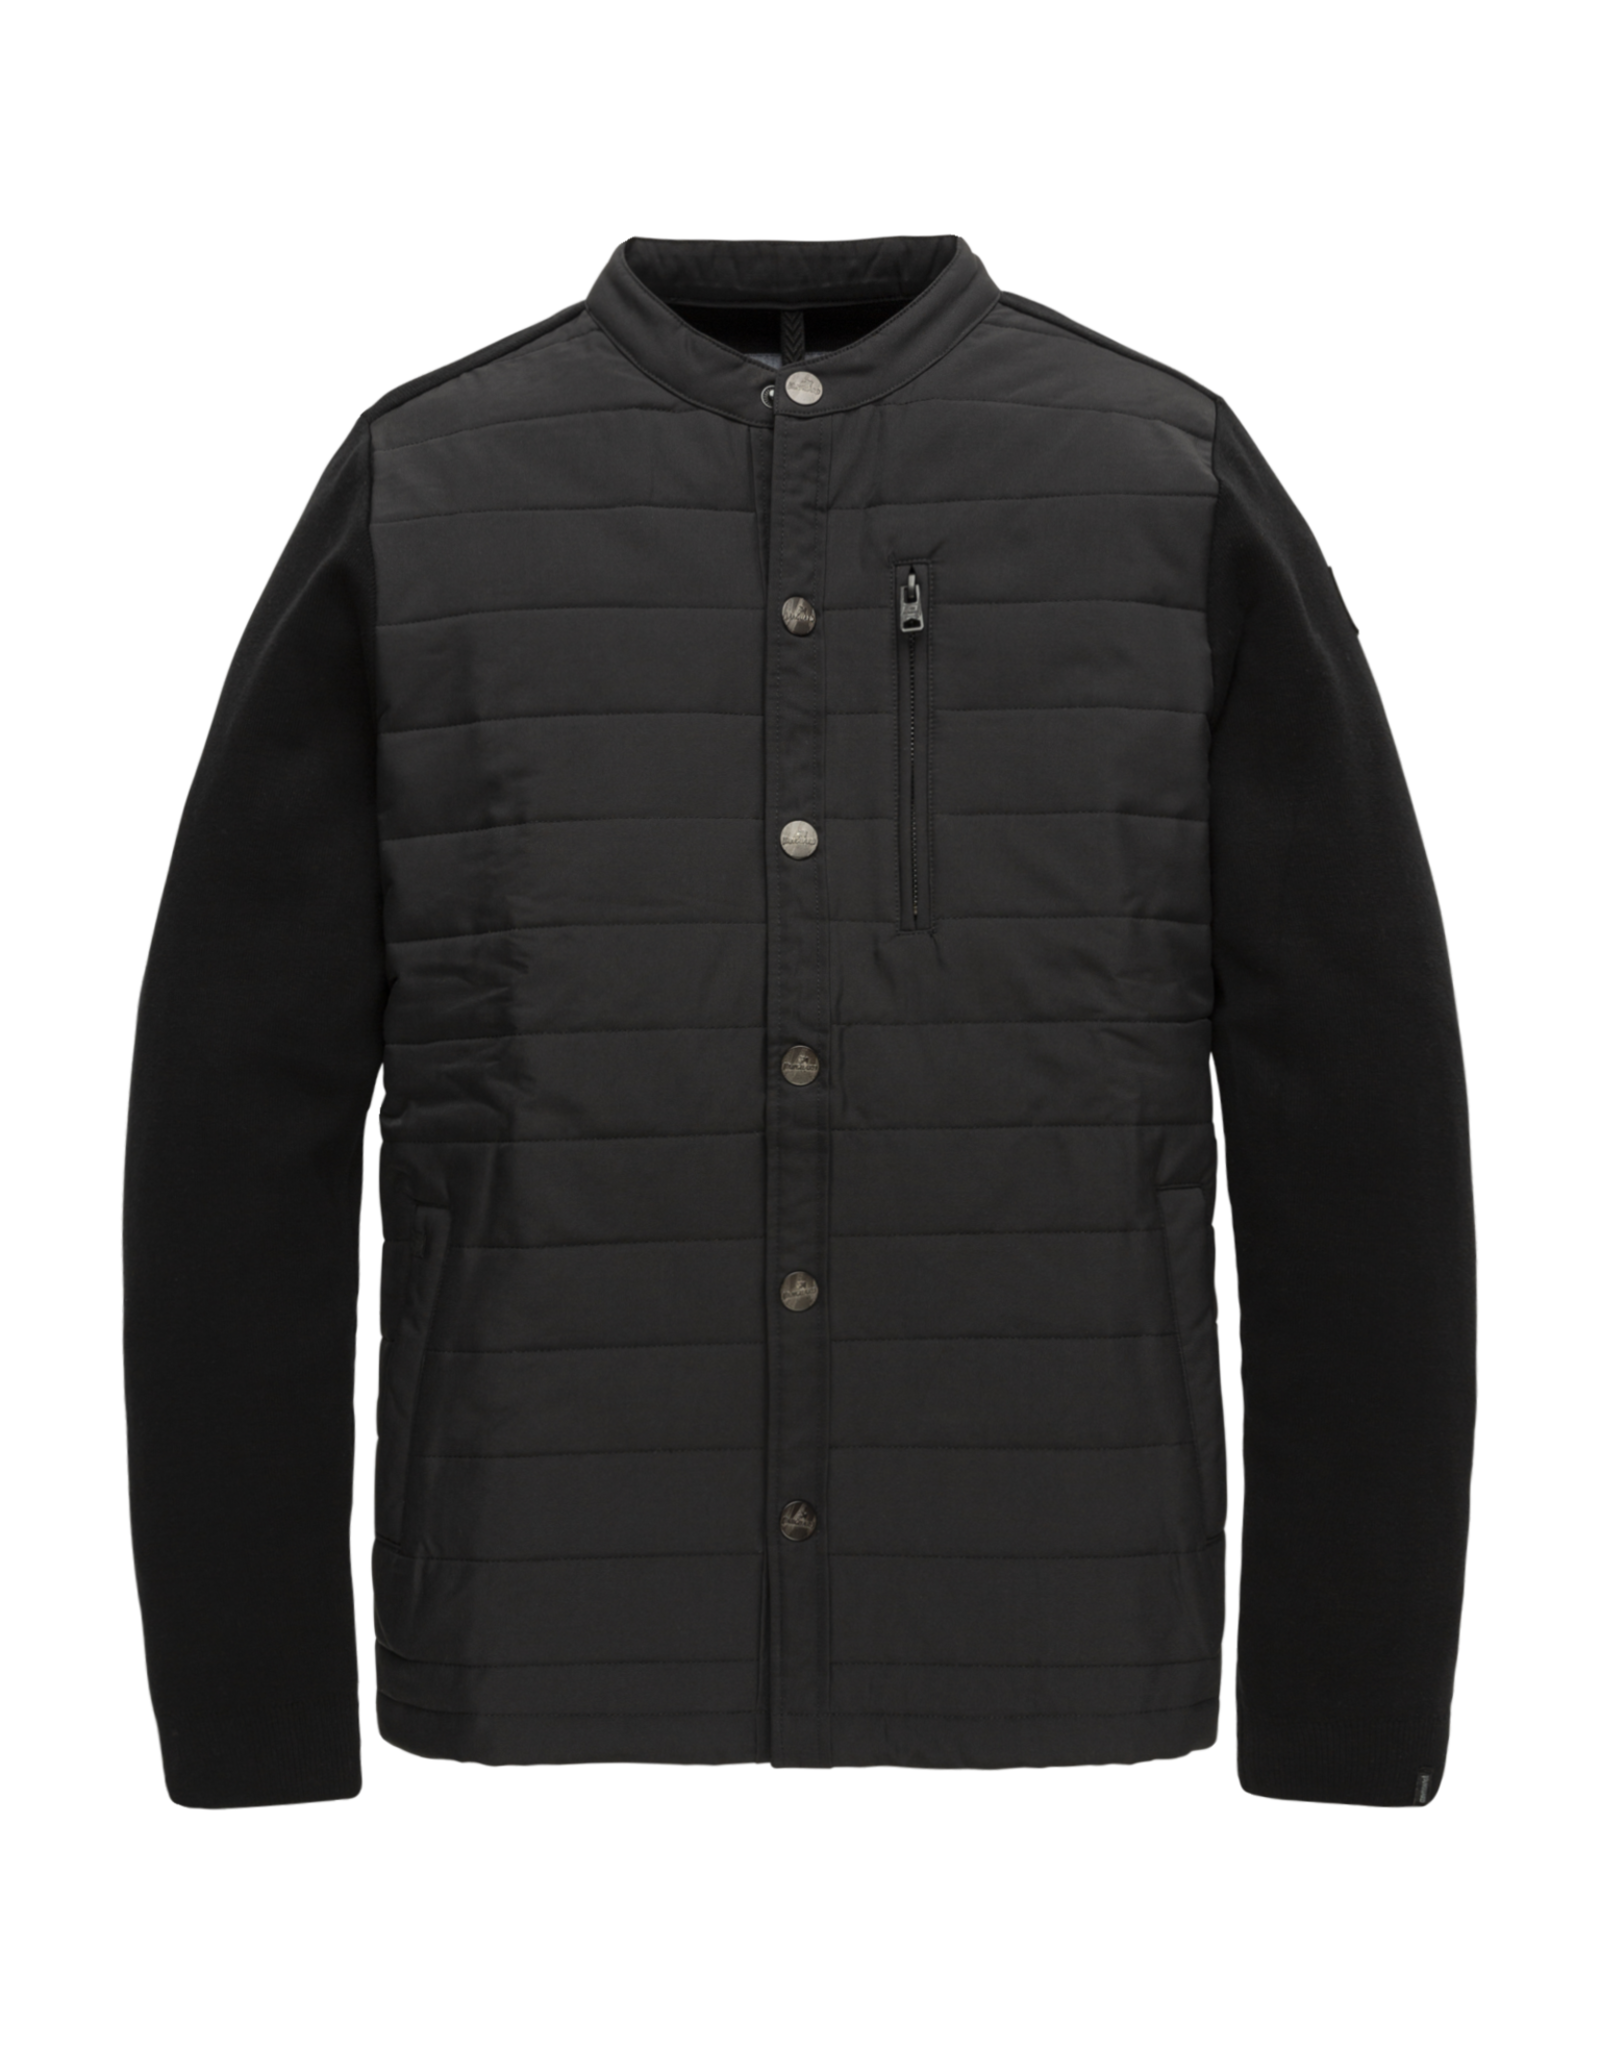 Vanguard Vanguard Zip jacket cotton material mix black onyx